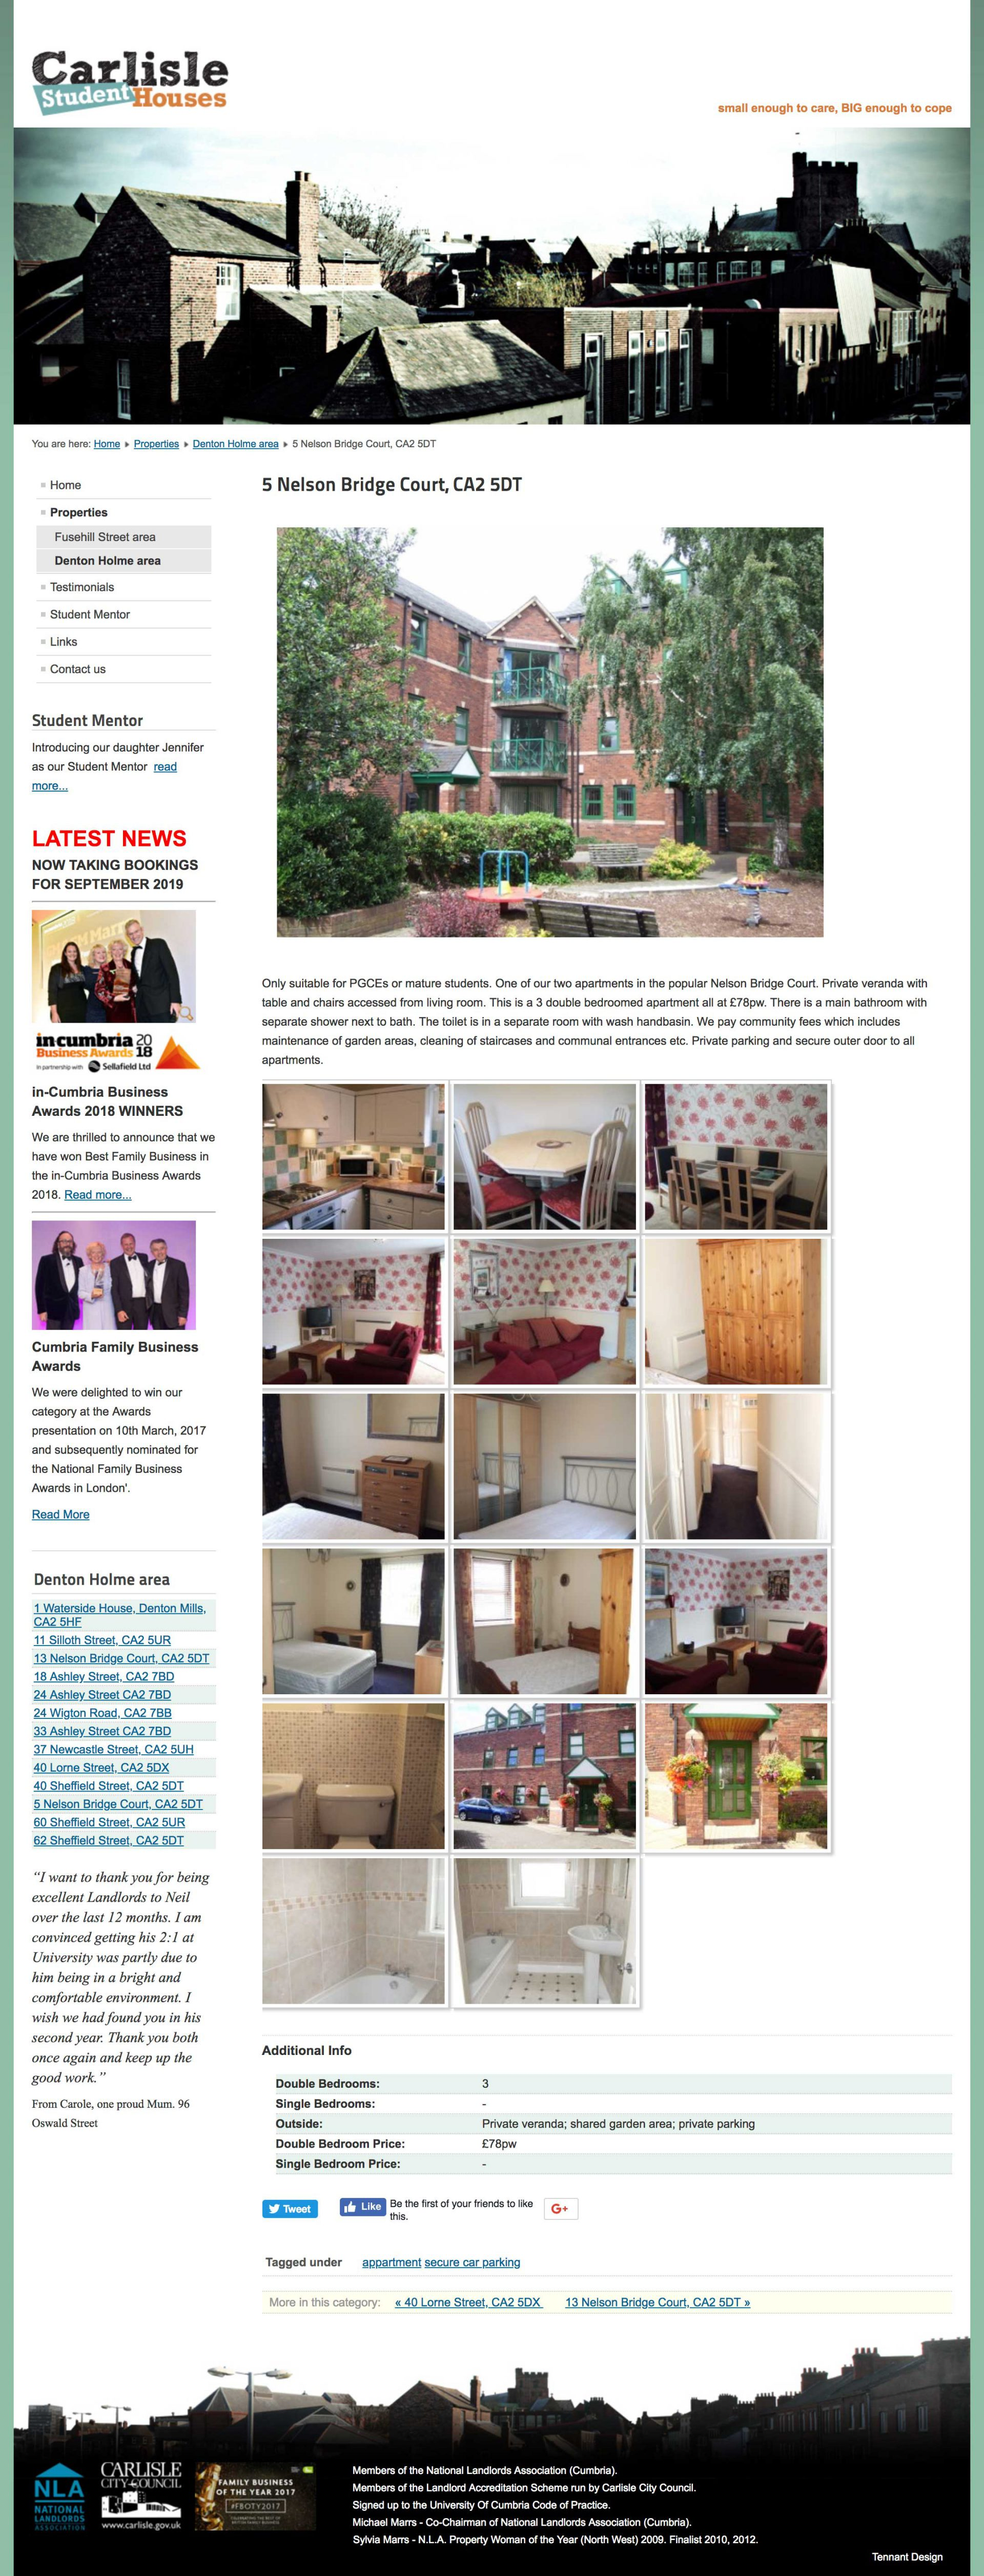 website design - carlisle student houses - item